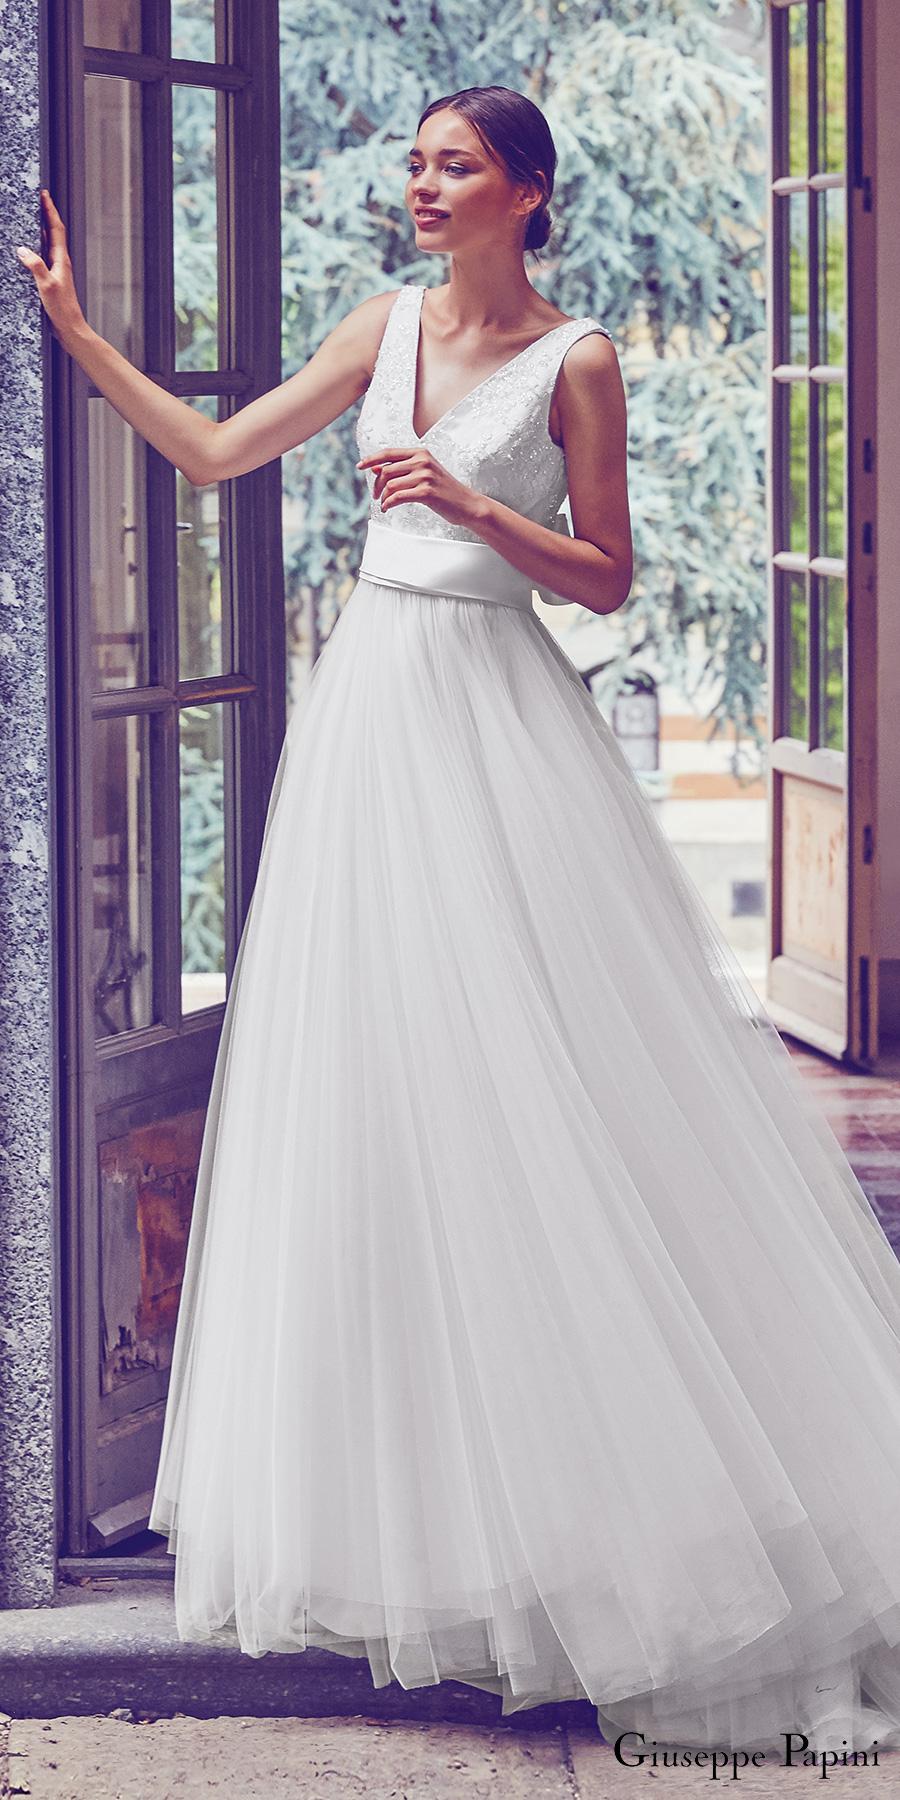 giuseppe papini 2017 (venice) sleeveless v neck beaded bodice a line wedding dress zfv